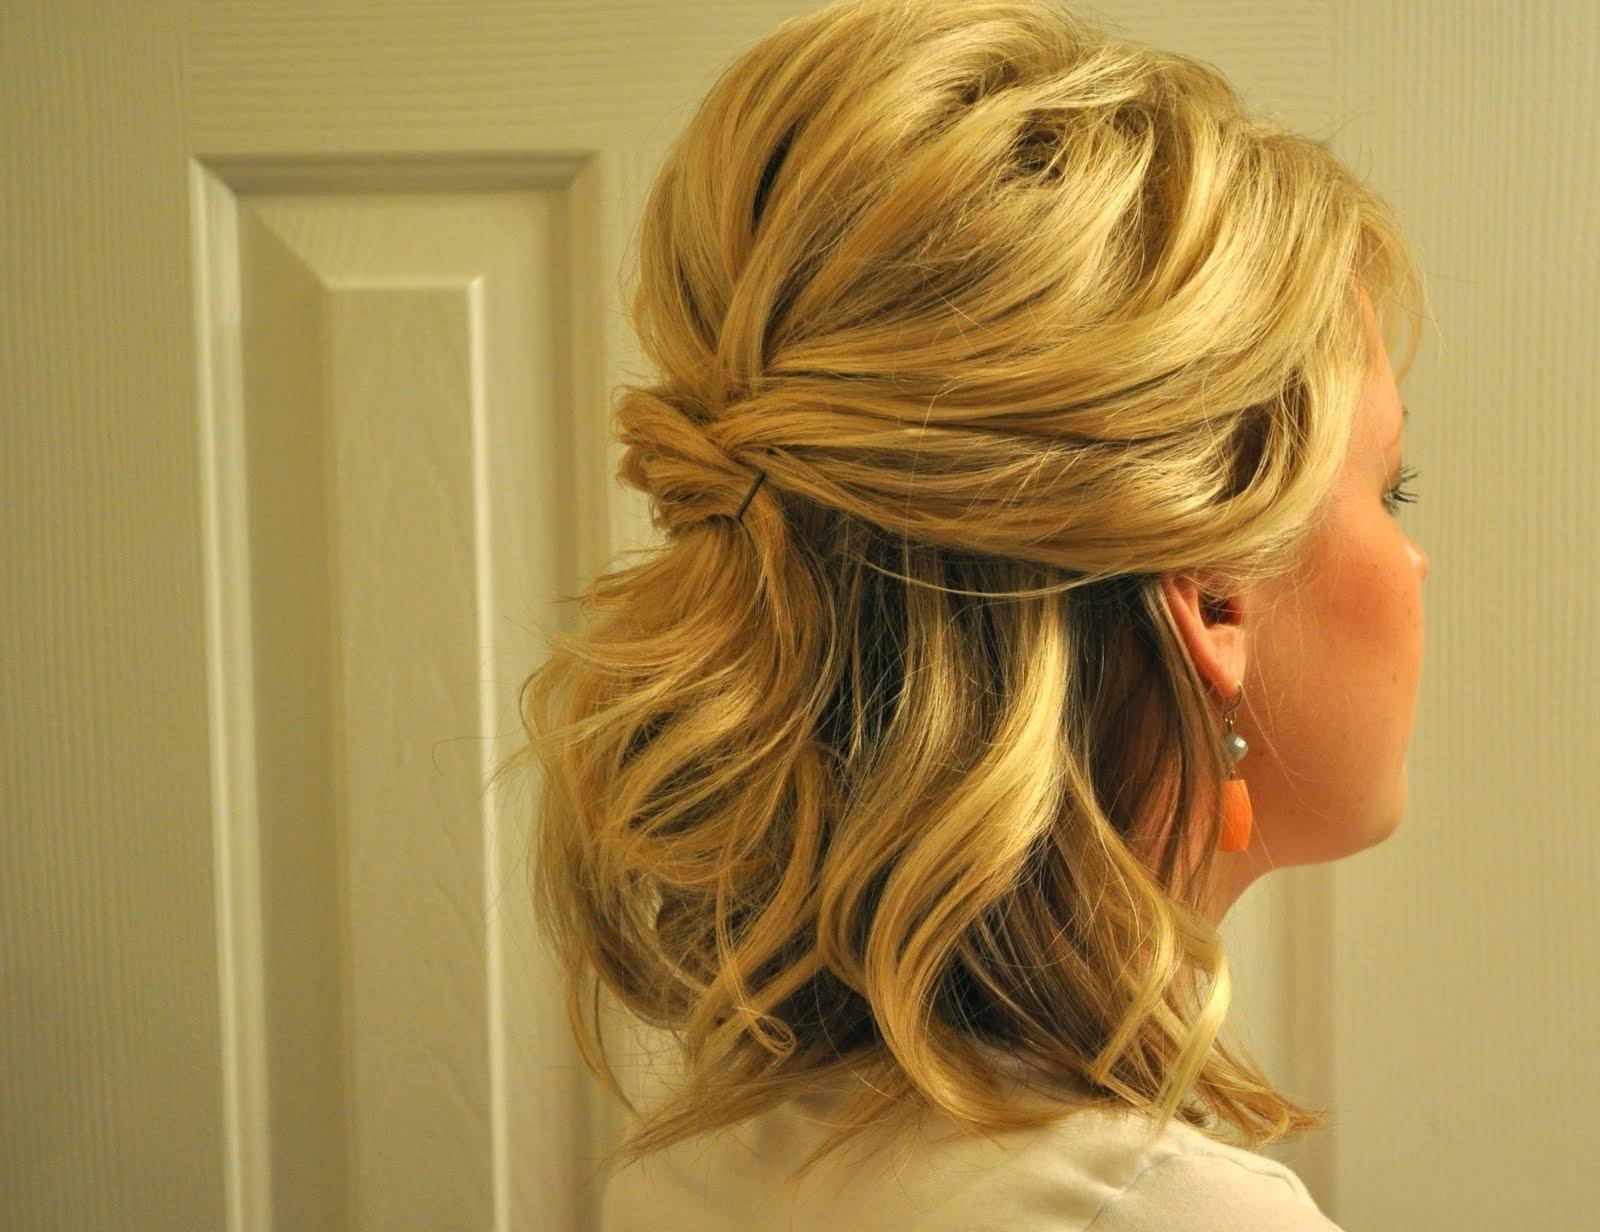 Popular Down Short Hair Wedding Hairstyles Pertaining To Short Half Up Hairstyles – Hairstyle For Women & Man (View 7 of 15)